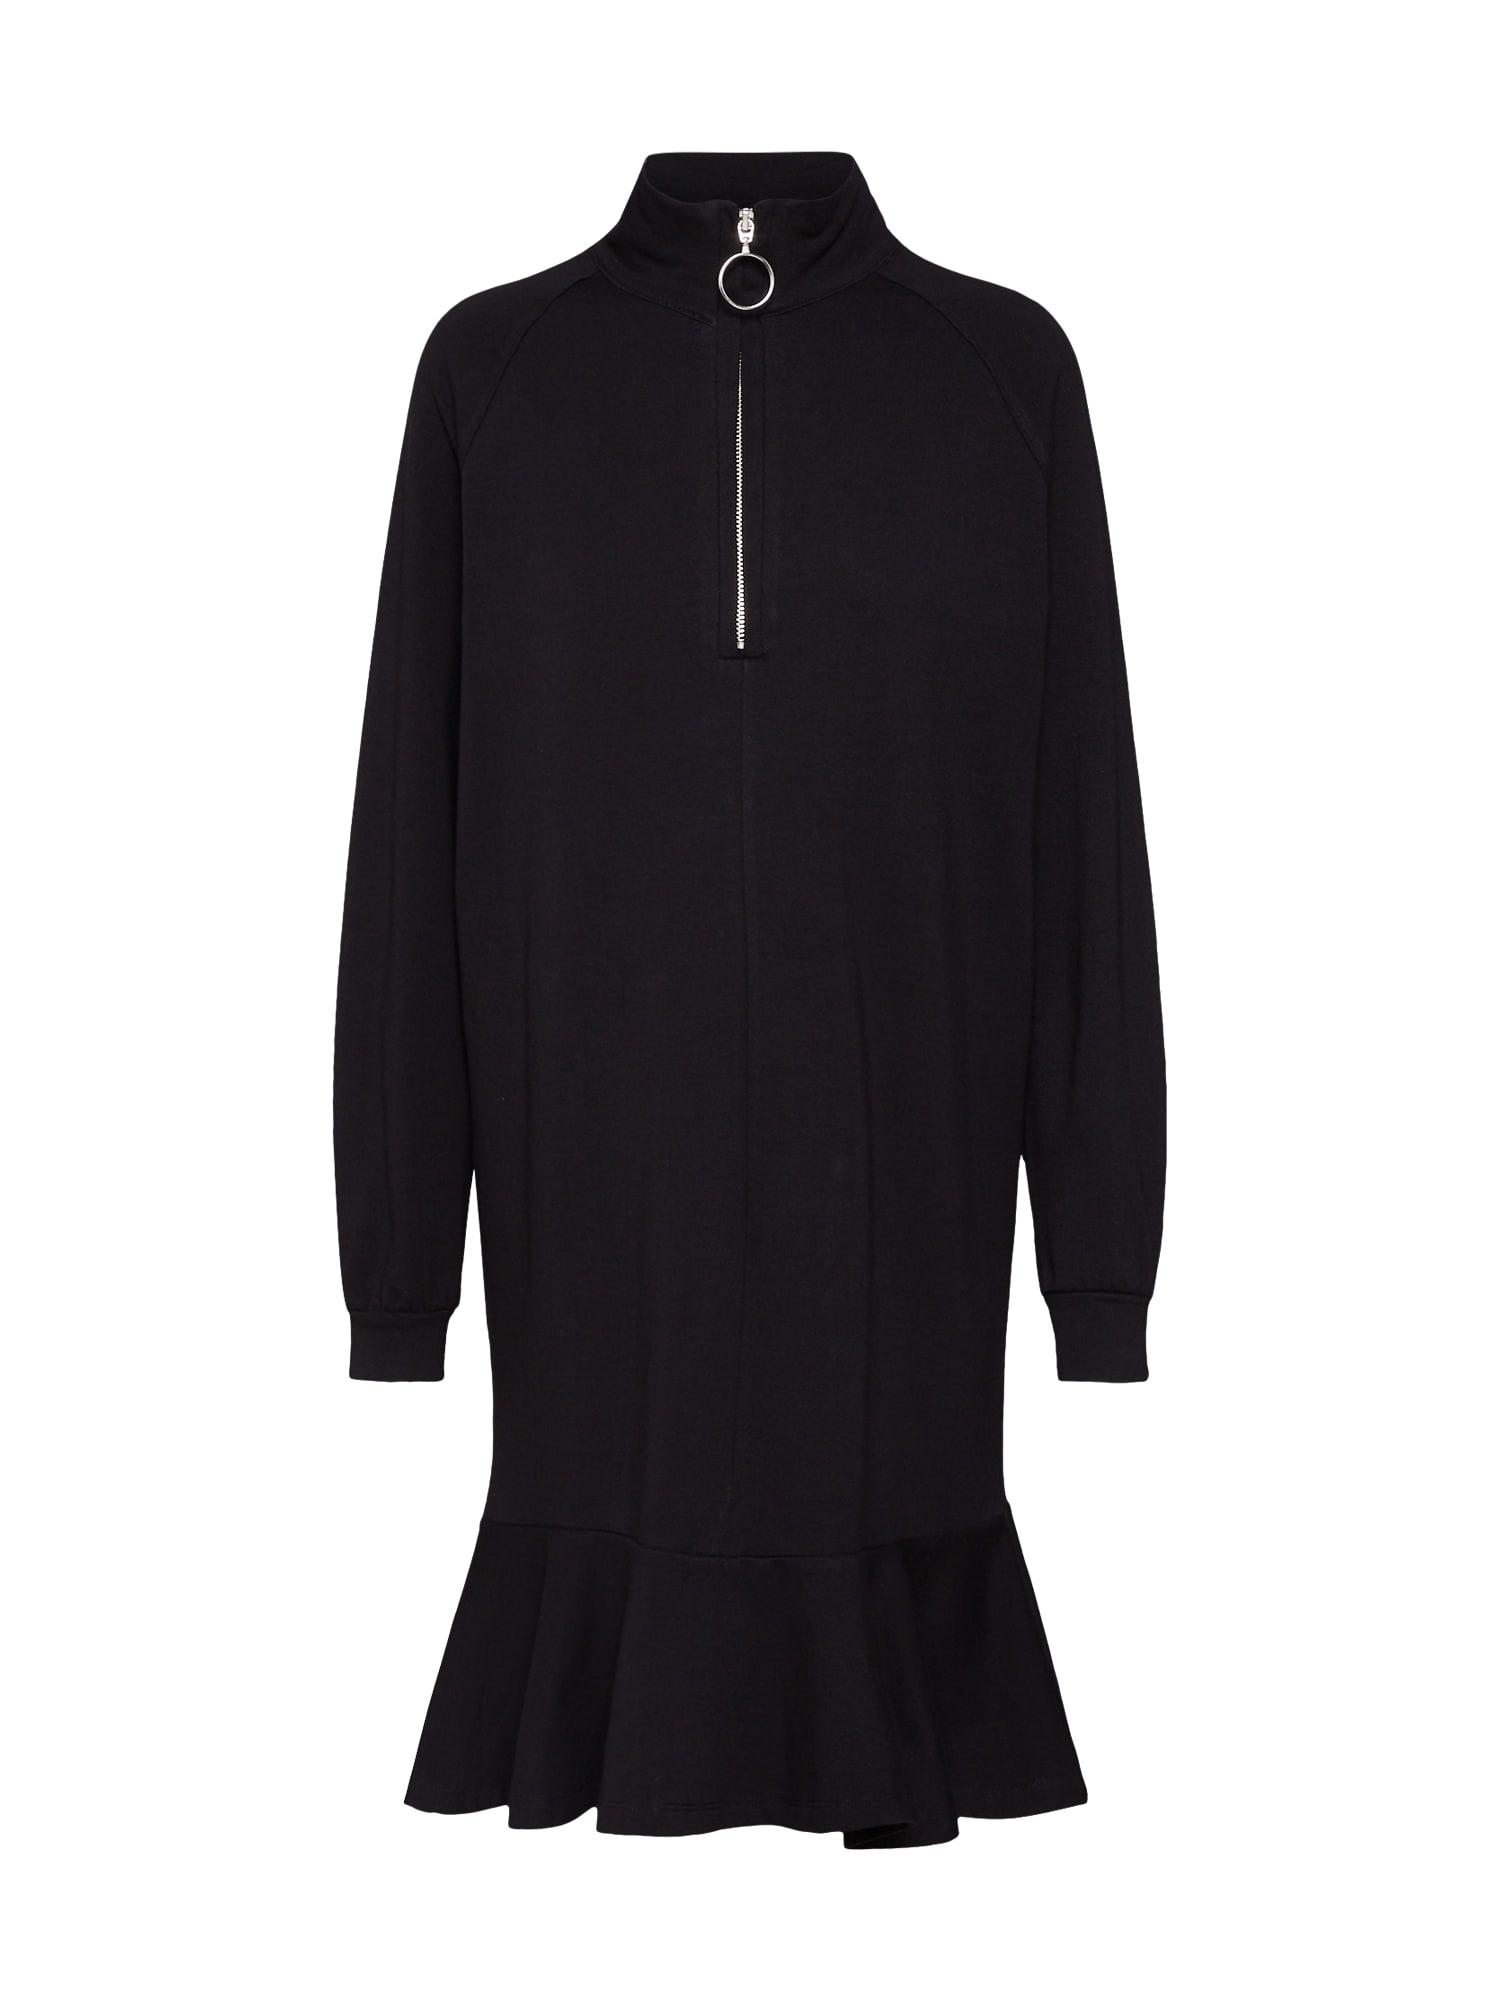 Šaty Vannia Dress černá Moves